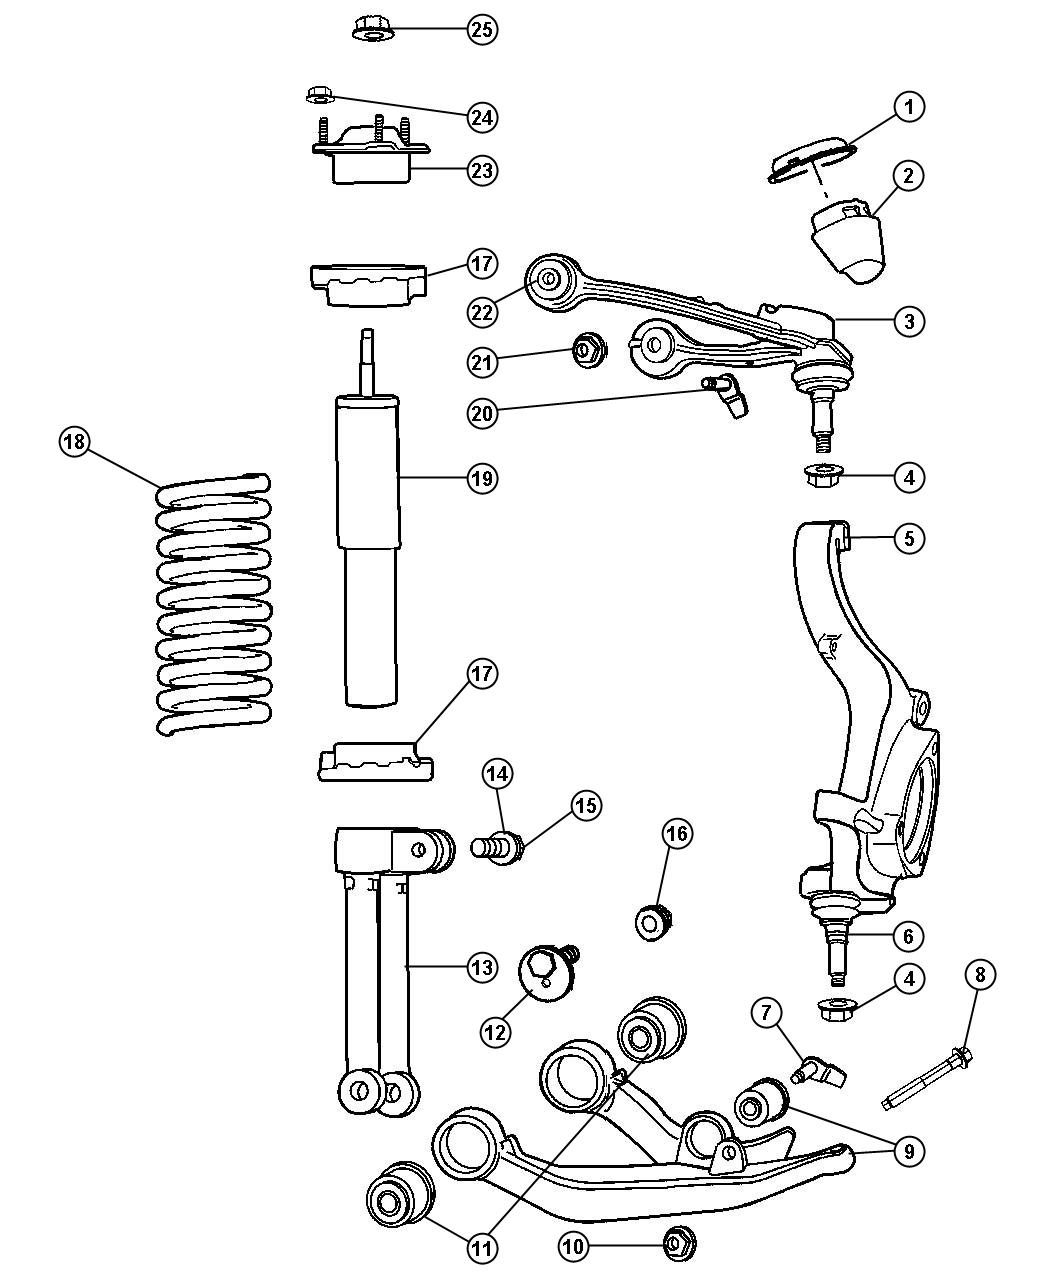 1989 harley electra glide wiring diagram